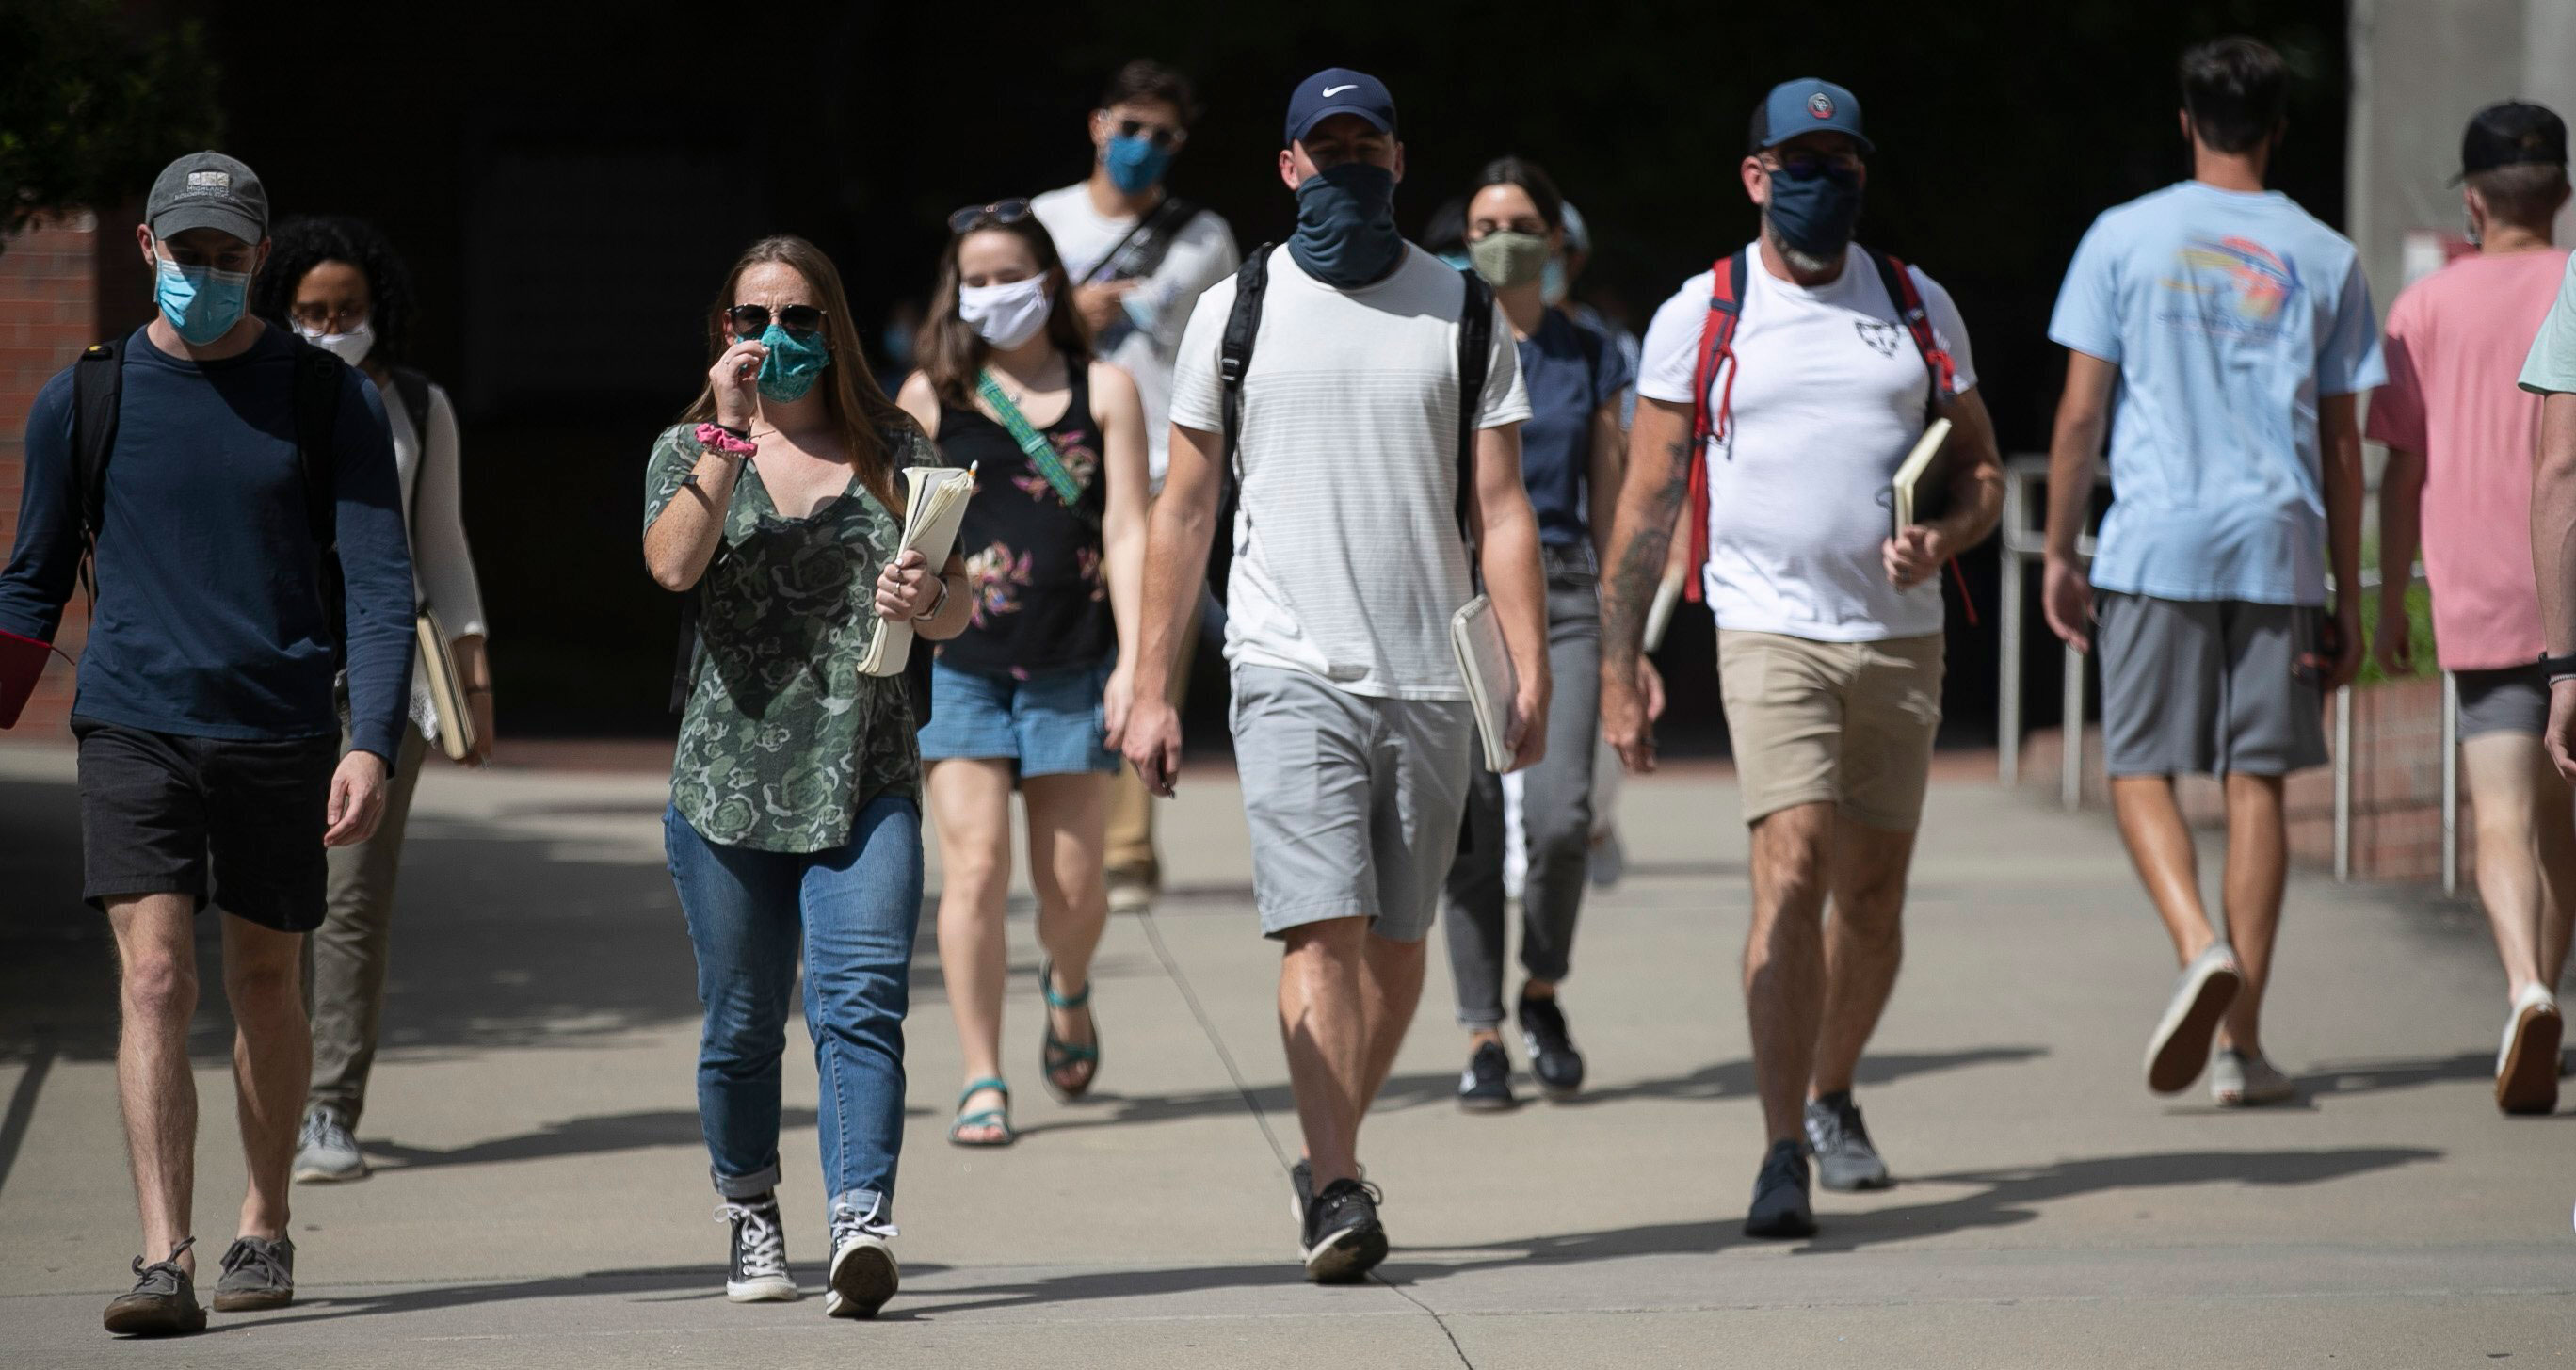 North Carolina State University students walk through campus on August 18 in Raleigh, North Carolina.